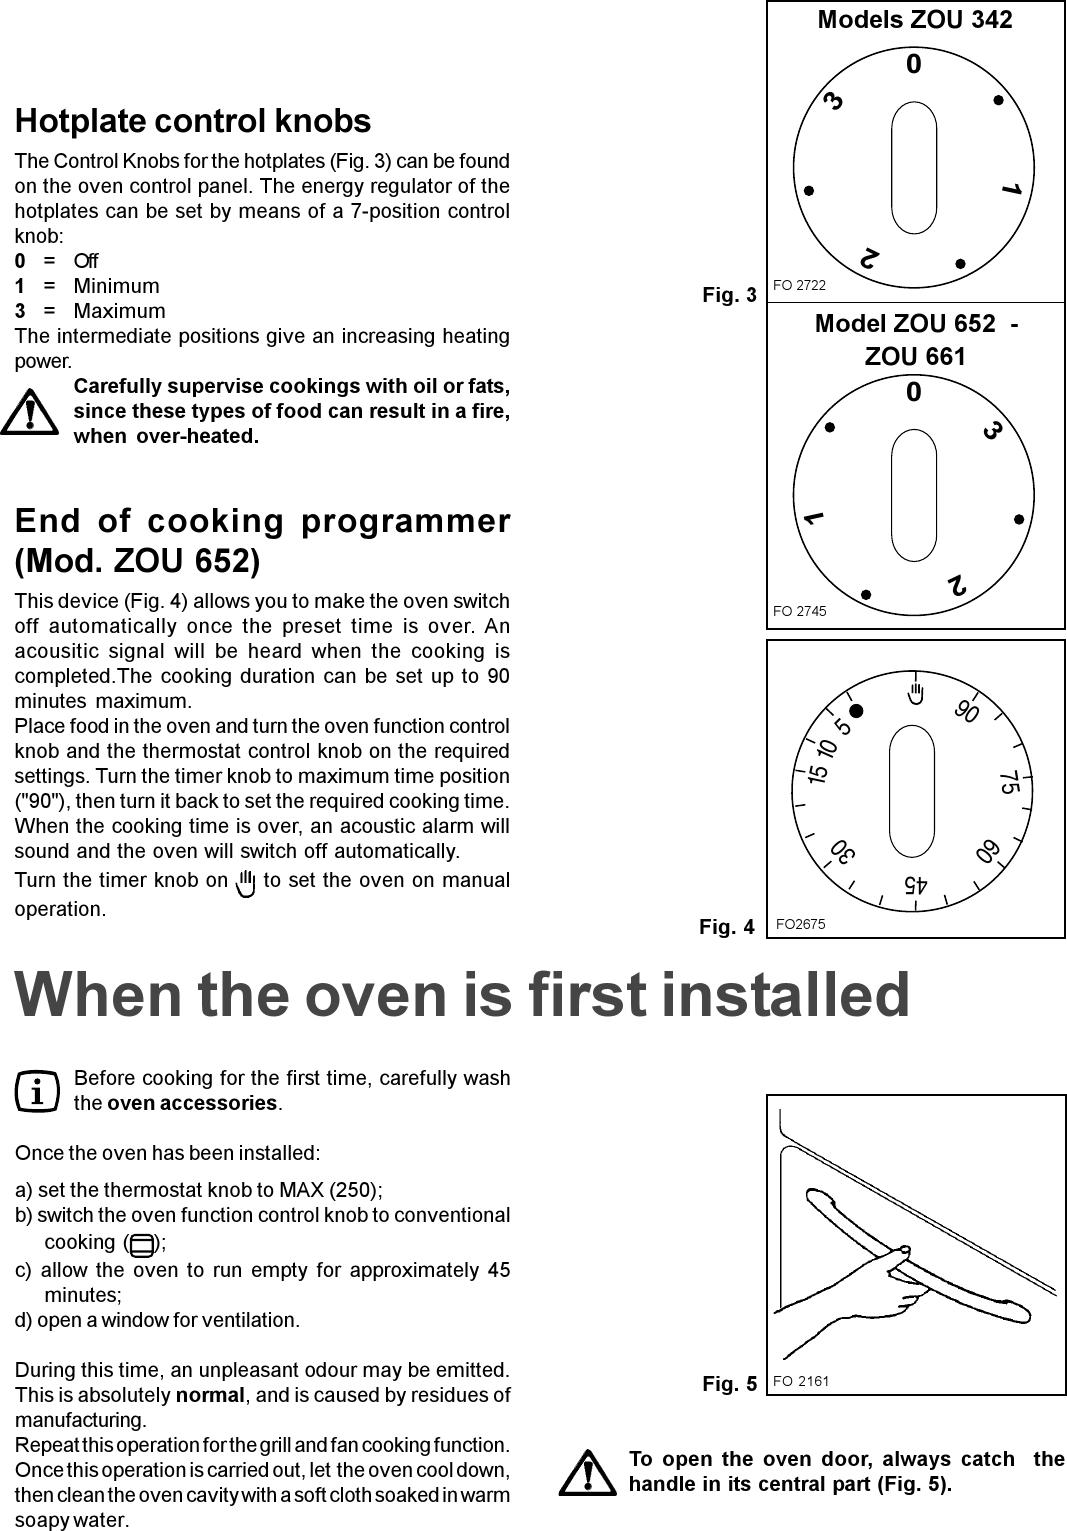 zanussi zou 342 users manual rh usermanual wiki zanussi refrigerator manual Robert Bosch GmbH